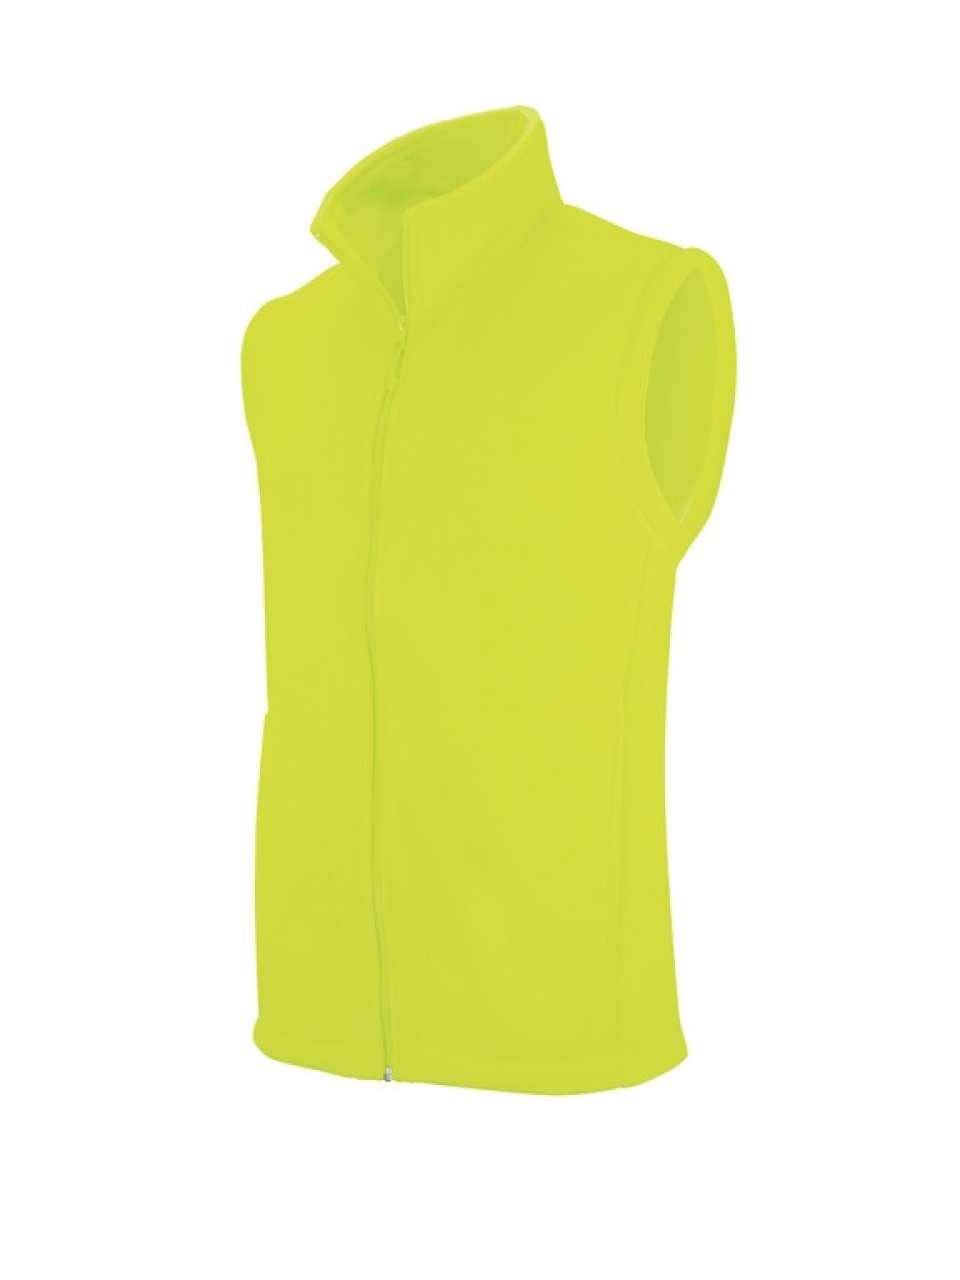 Vesta fleece KA913 fluorescent yellow veste jachete dama barbatesti polar fleece softshell fas gluga ploaie vant broderie serigrafie termotransfer | Toroadv.ro